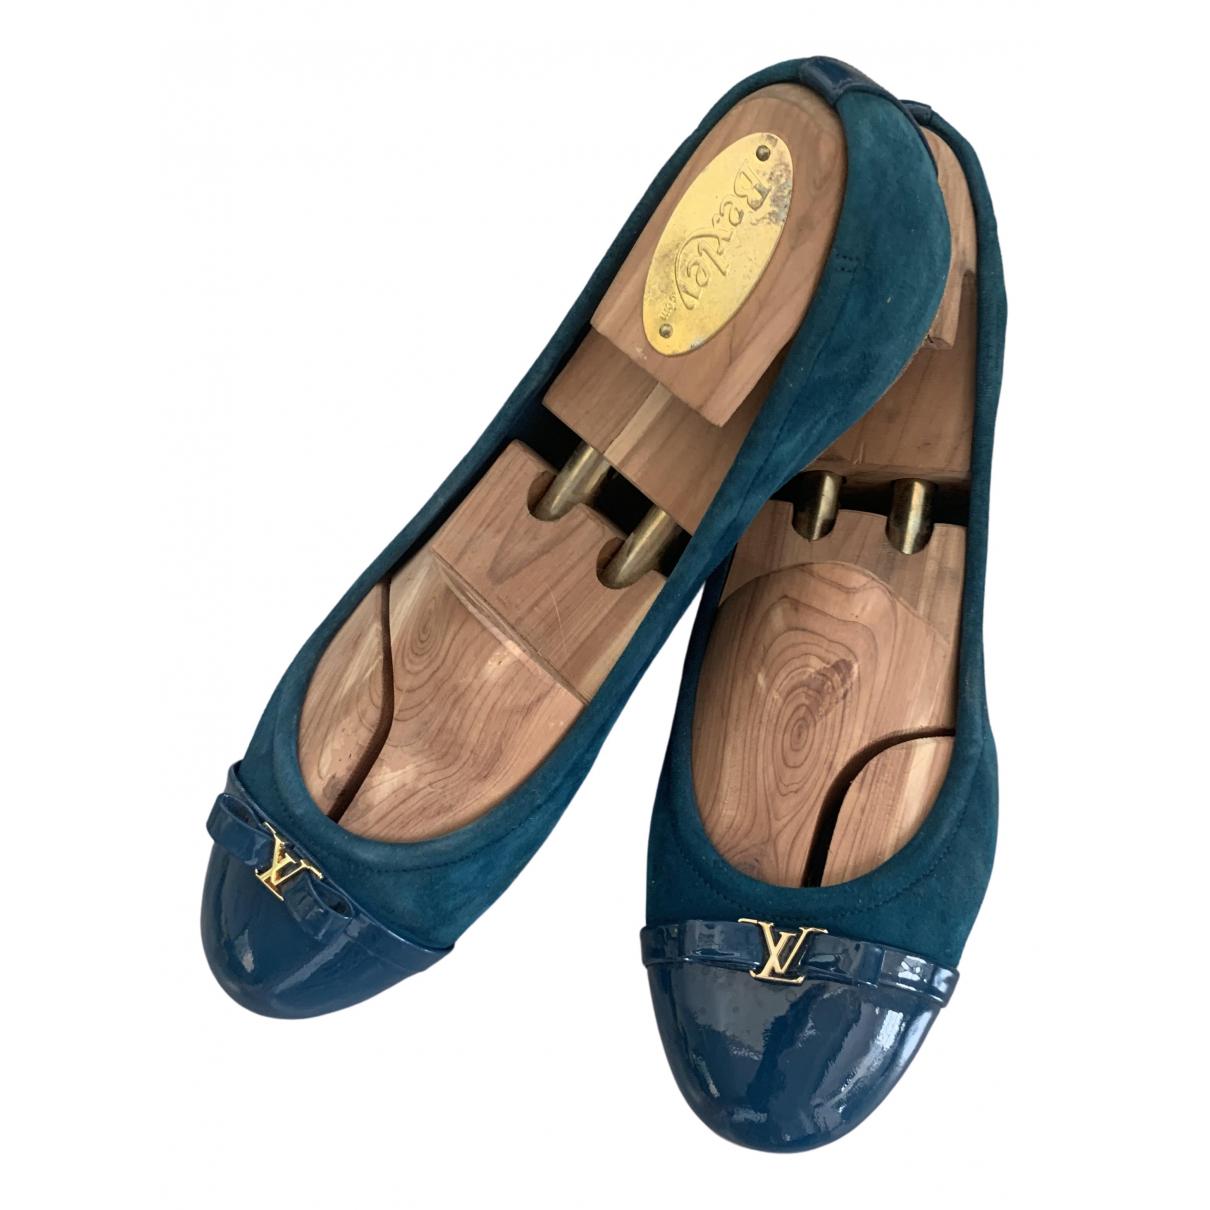 Louis Vuitton \N Blue Suede Ballet flats for Women 39 EU